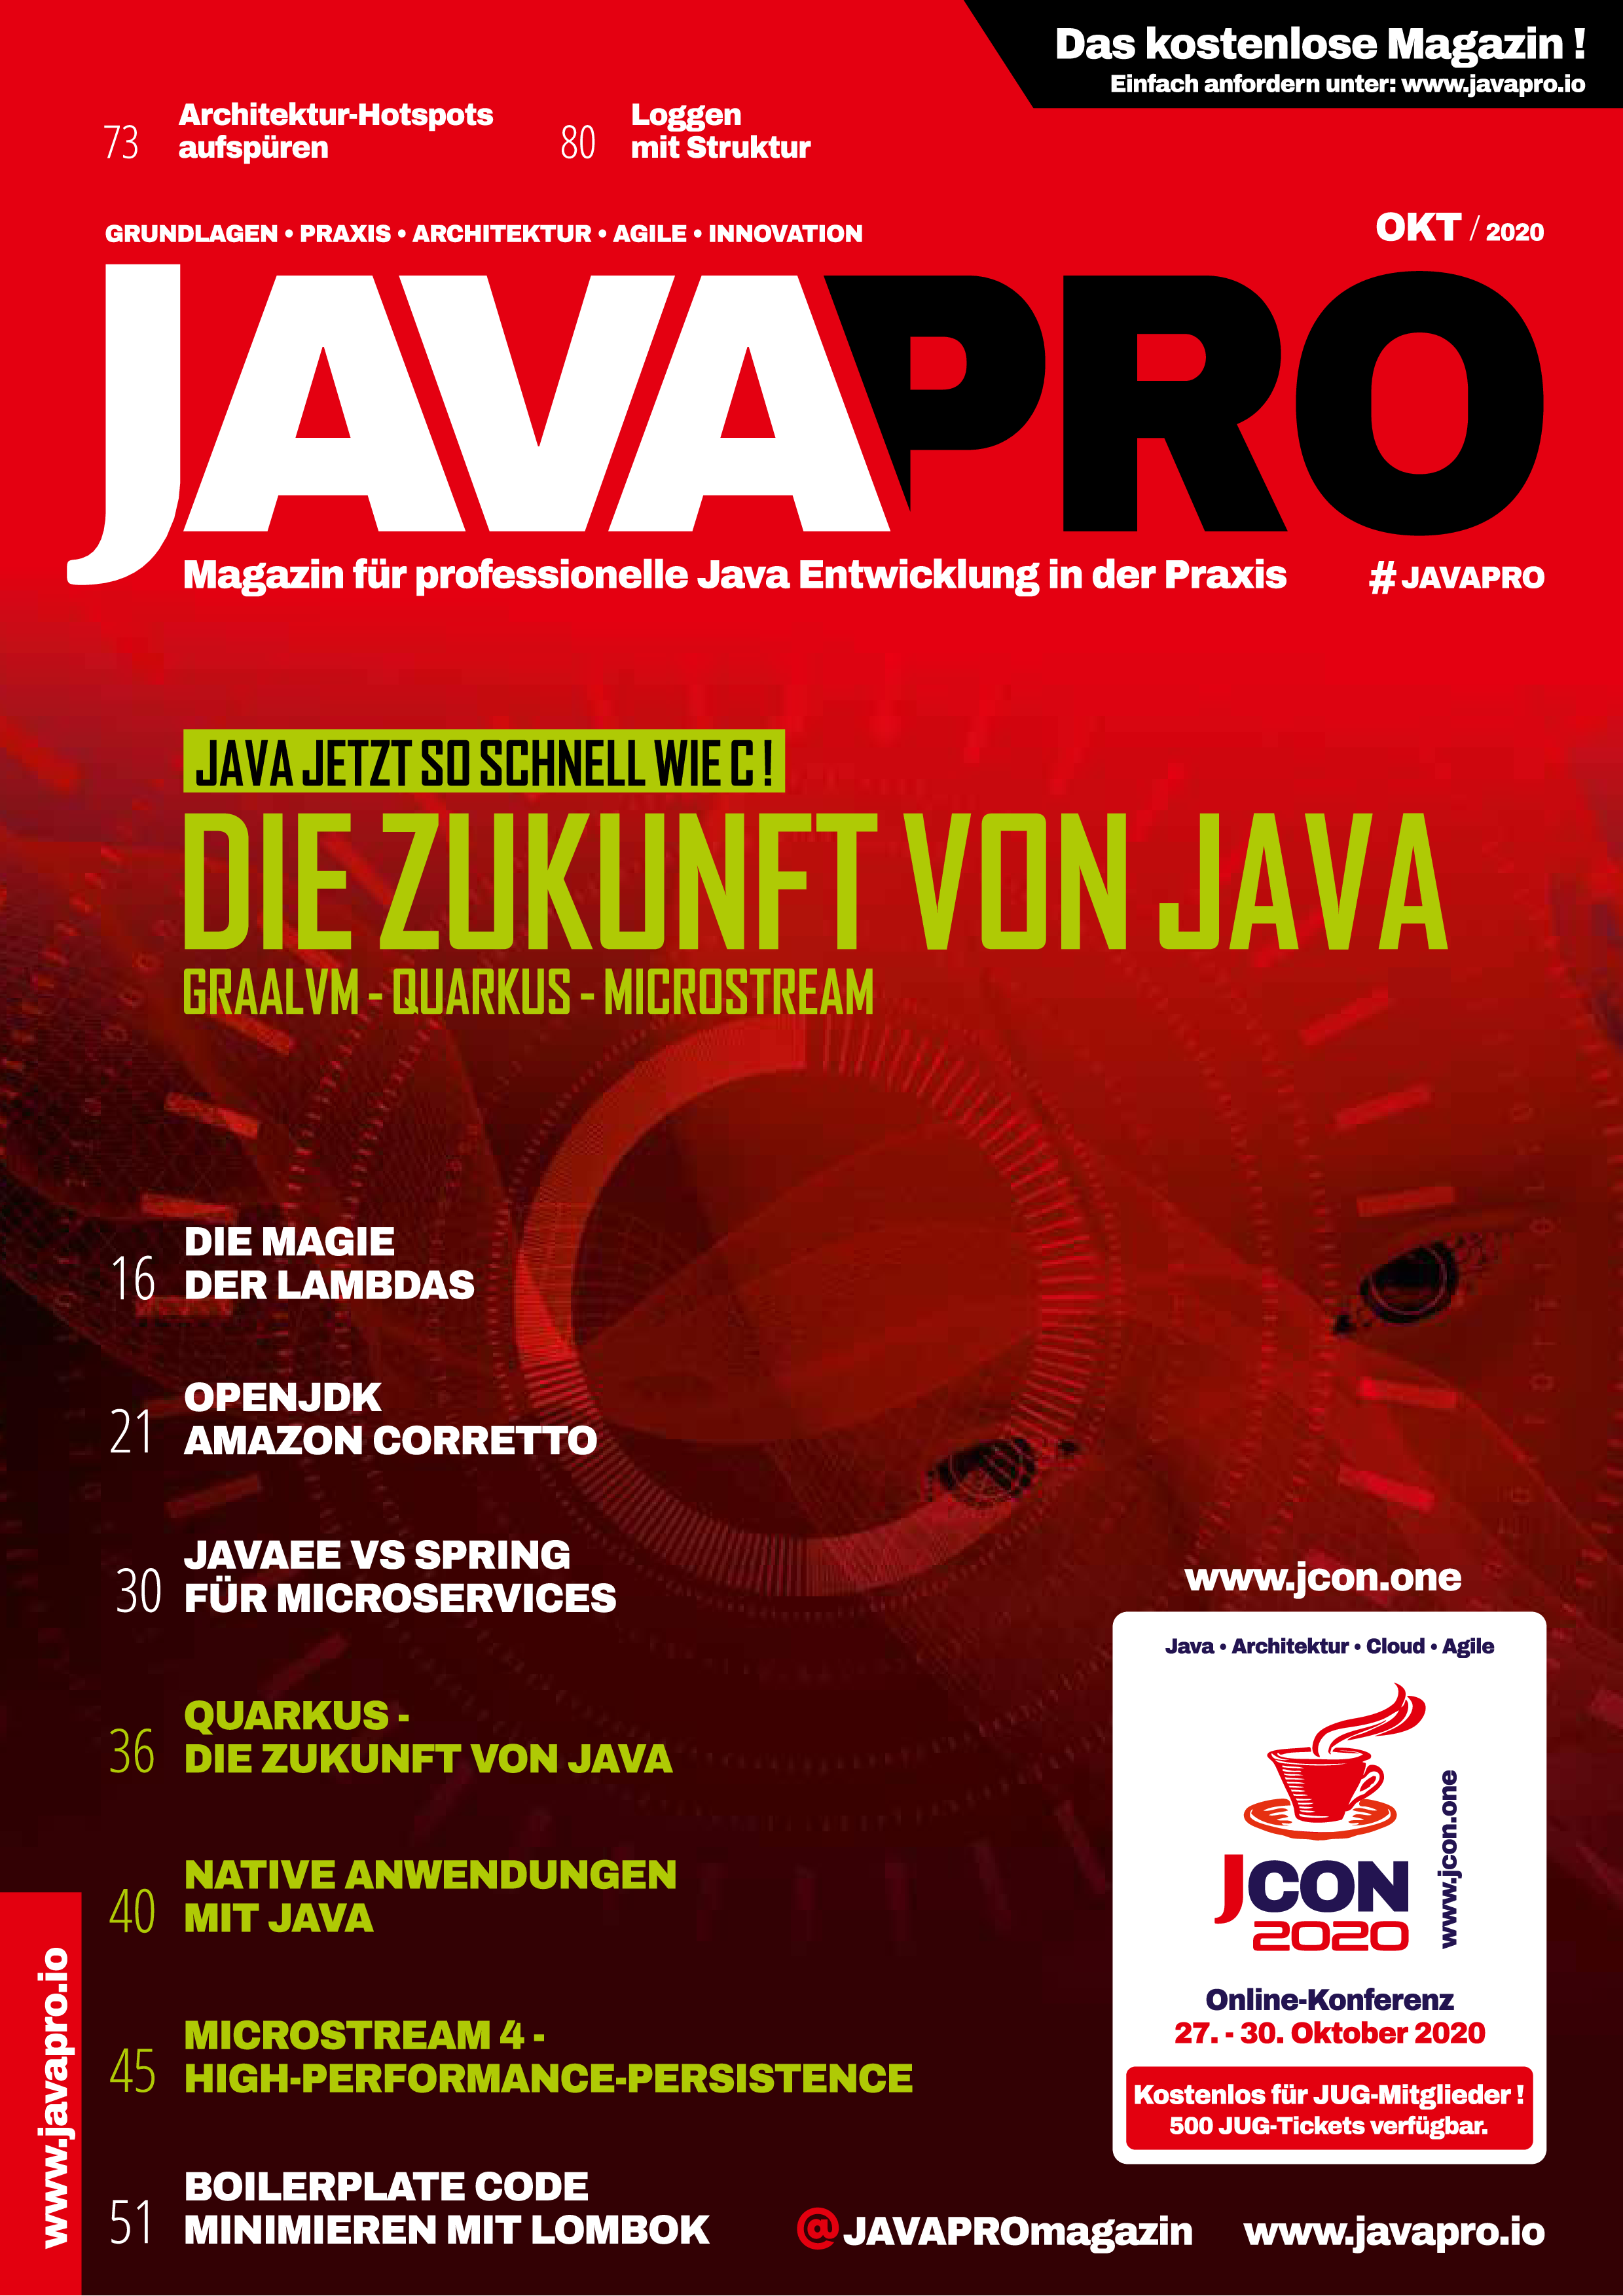 JAVAPRO 01 - 2020